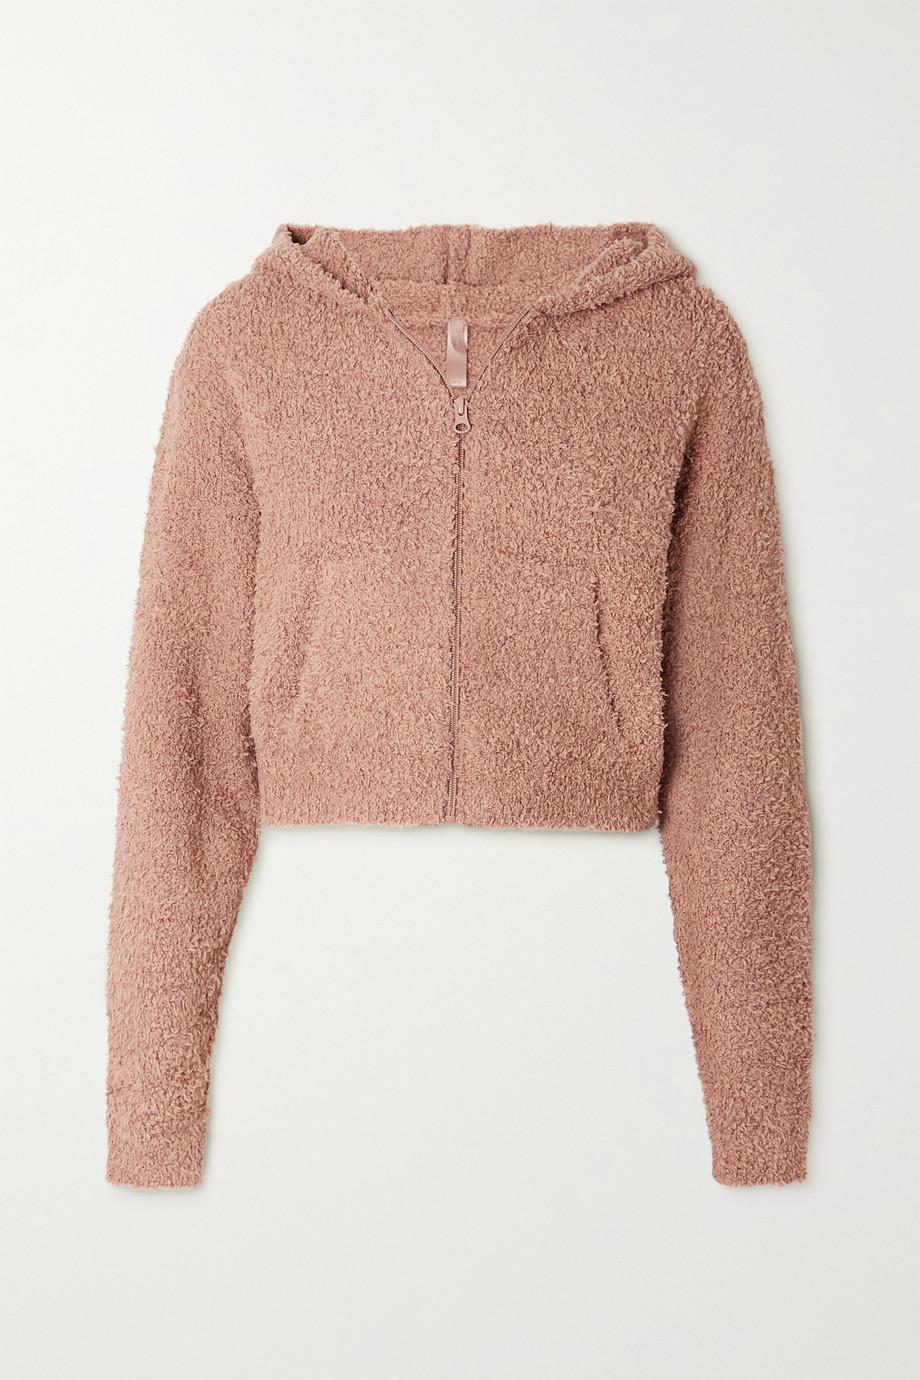 SKIMS Cozy Knit Zip Up Hoodie – Rose Clay – Kapuzenjacke aus Bouclé